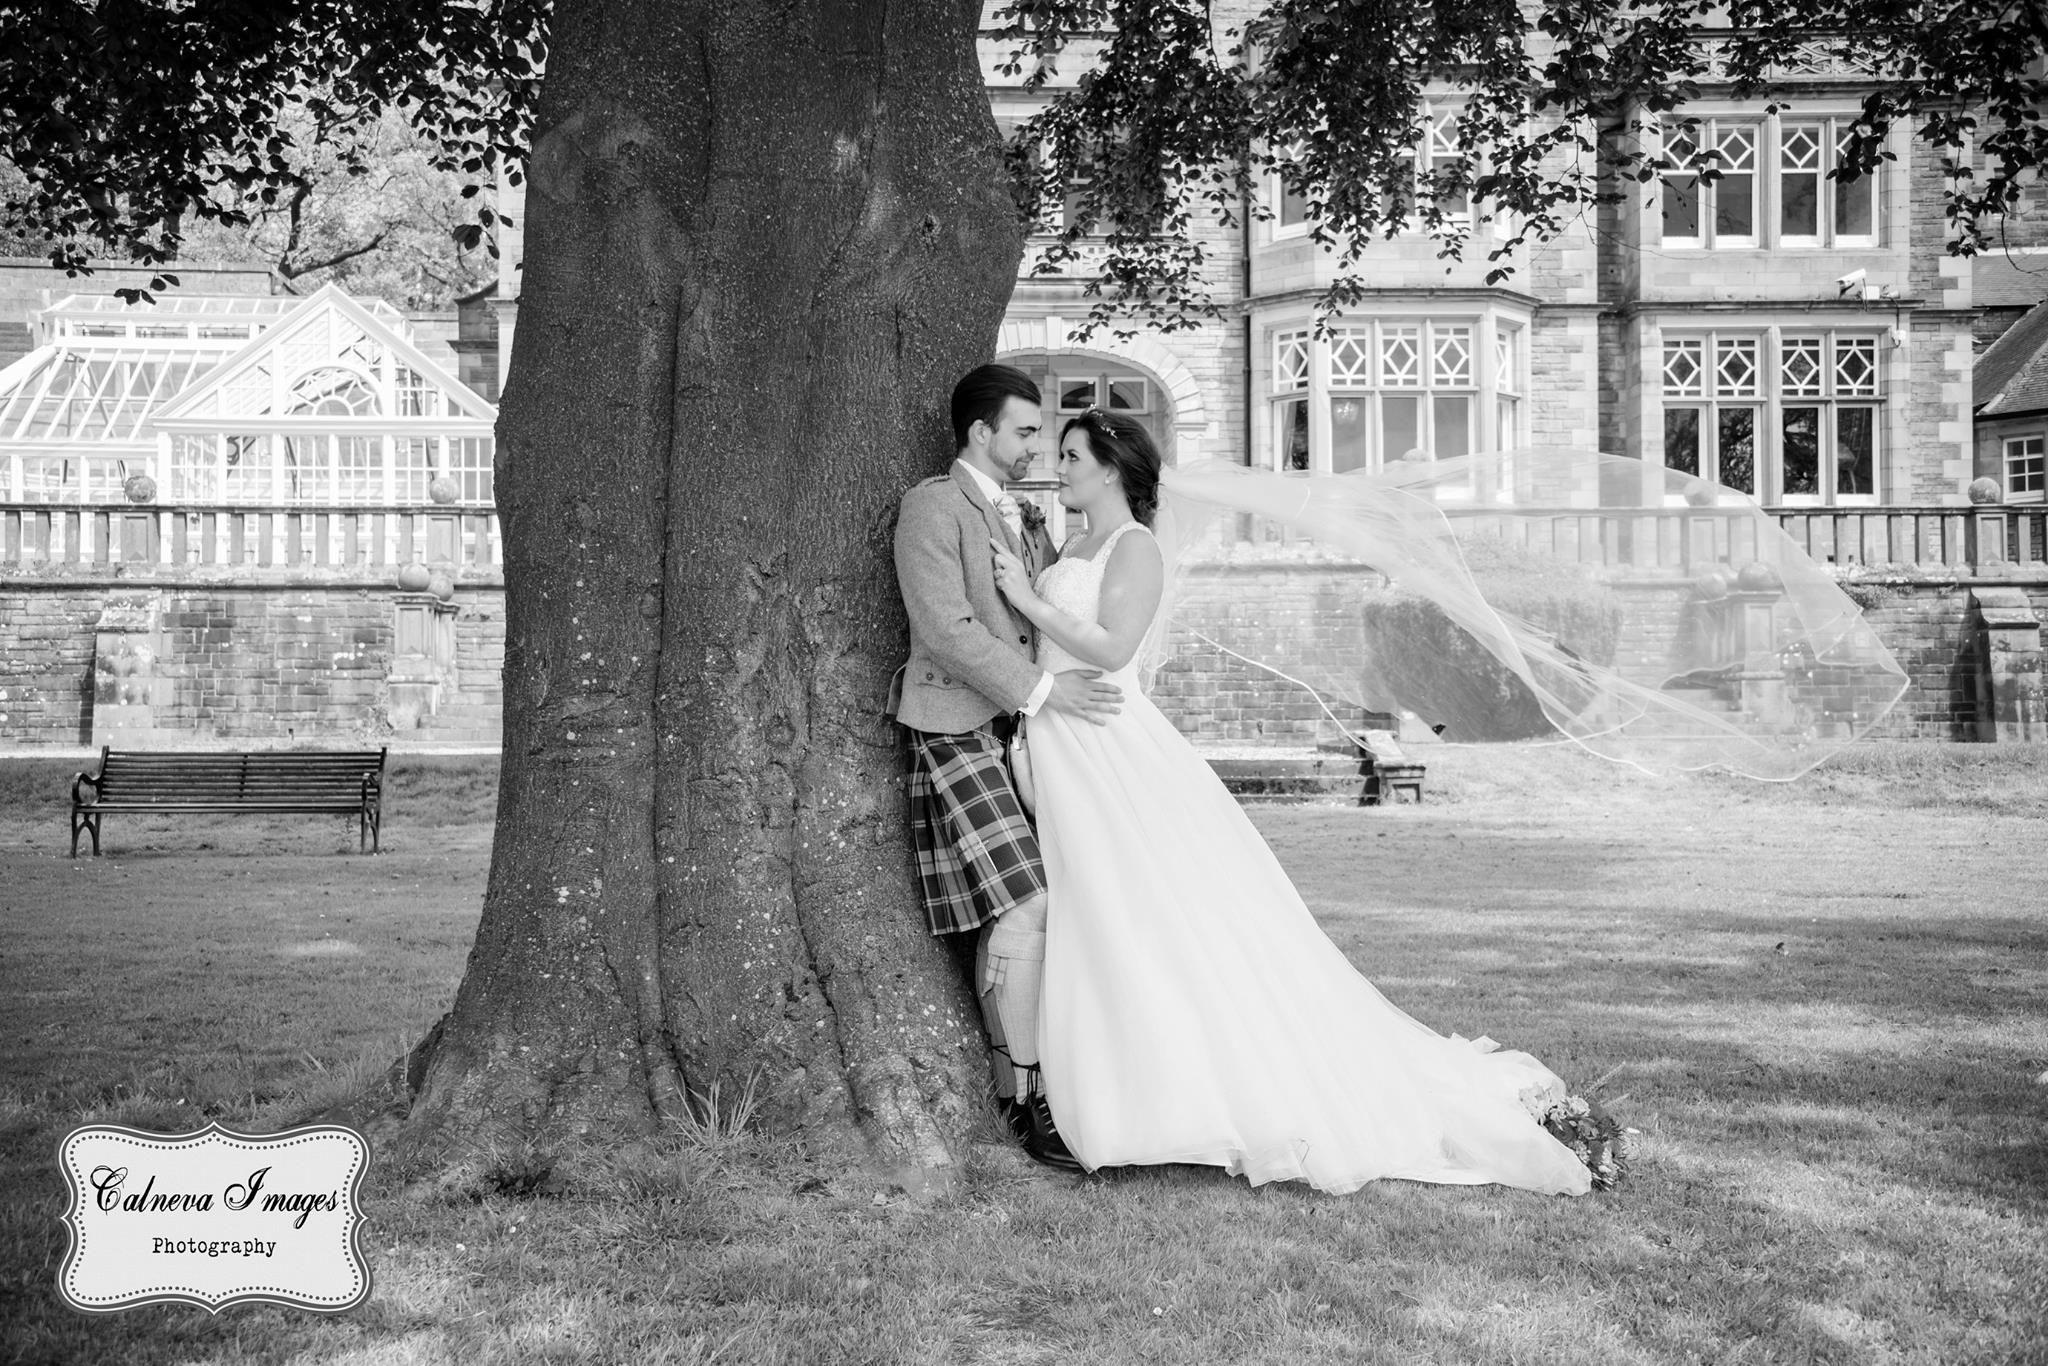 Wedding Venue In Clackmannanshire Central Scotland Near Stirling